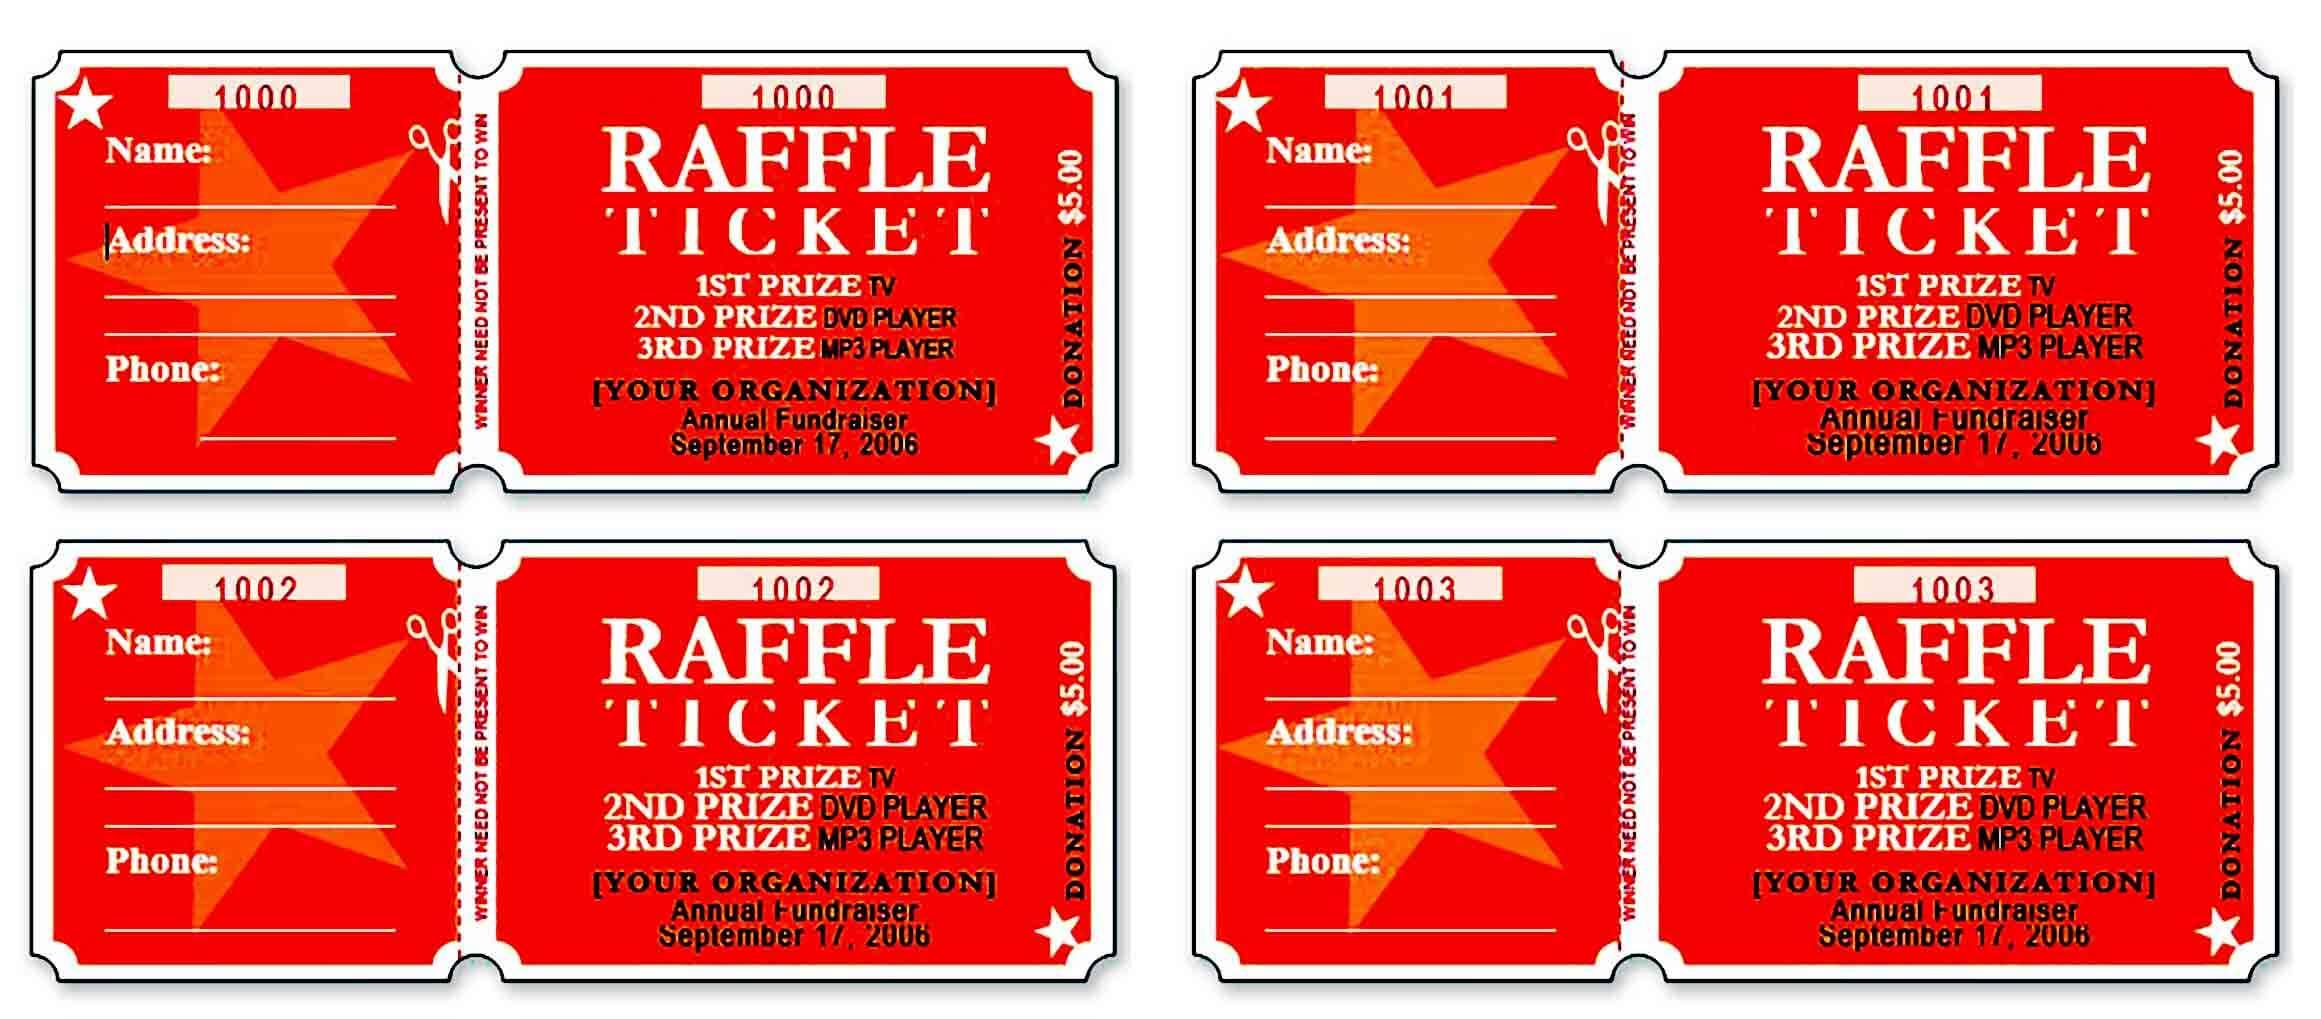 raffle ticket templatess